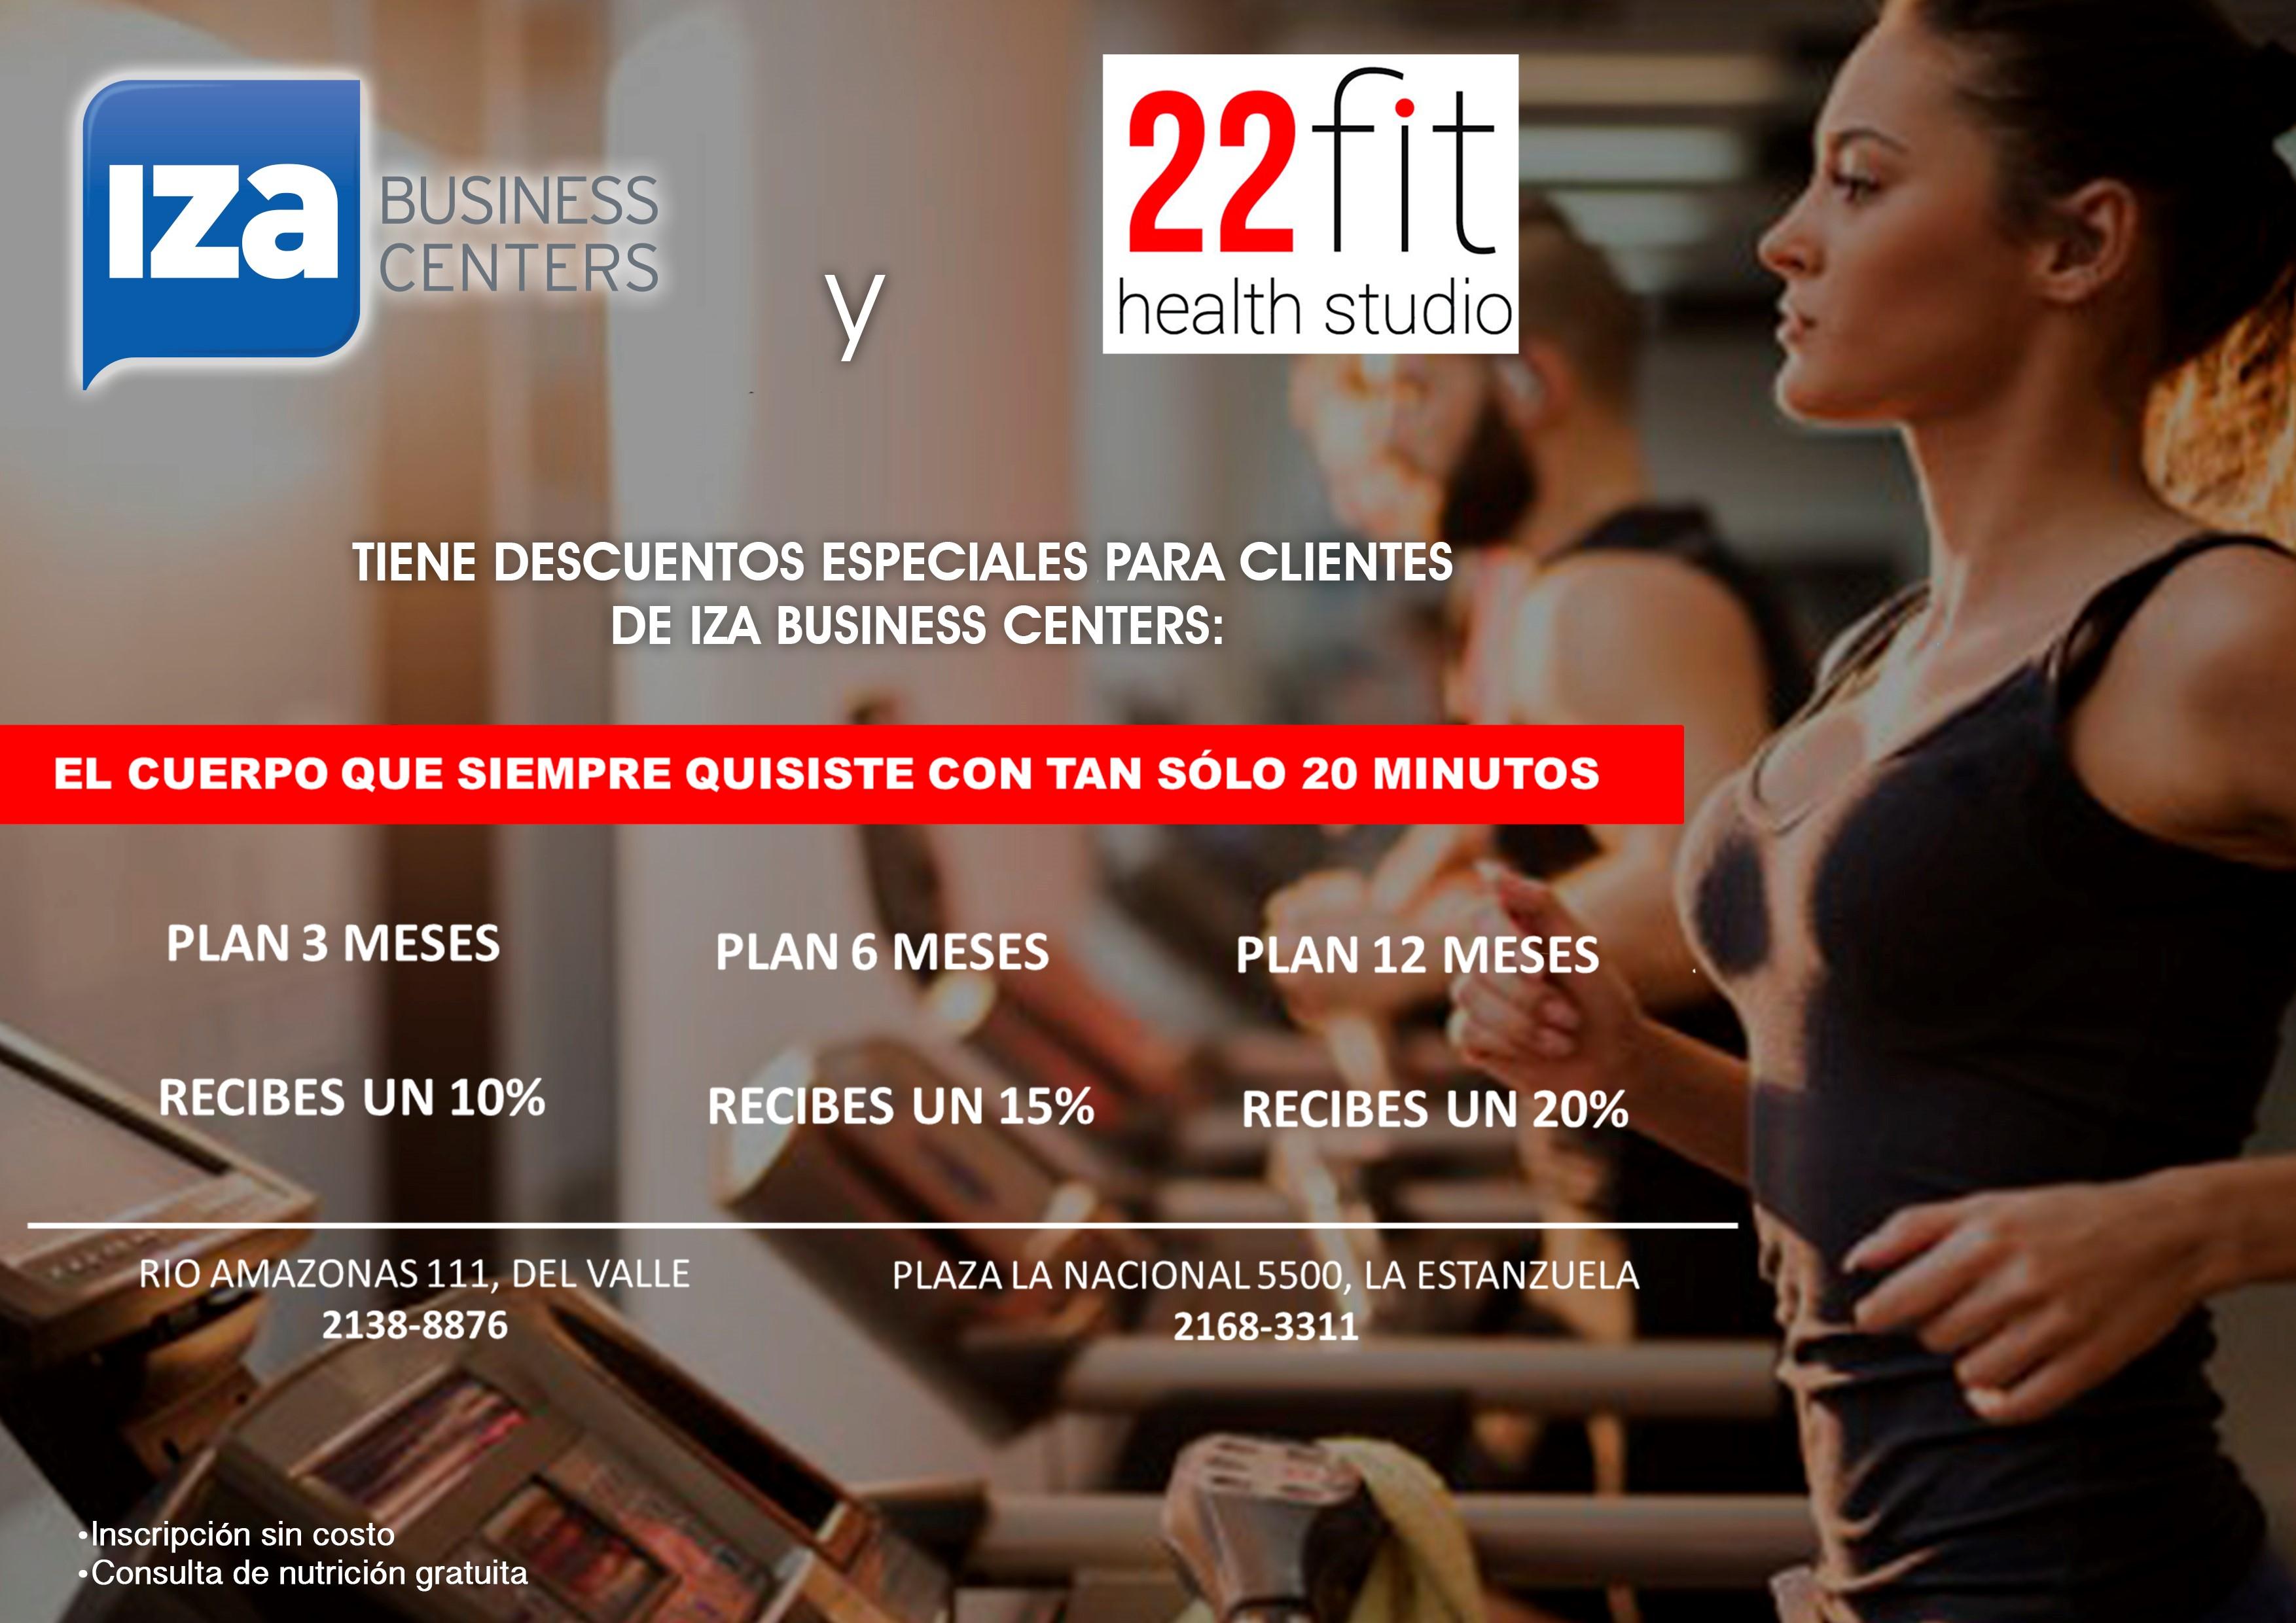 Convenio para clientes IZABC MTY 22 fit health_-3